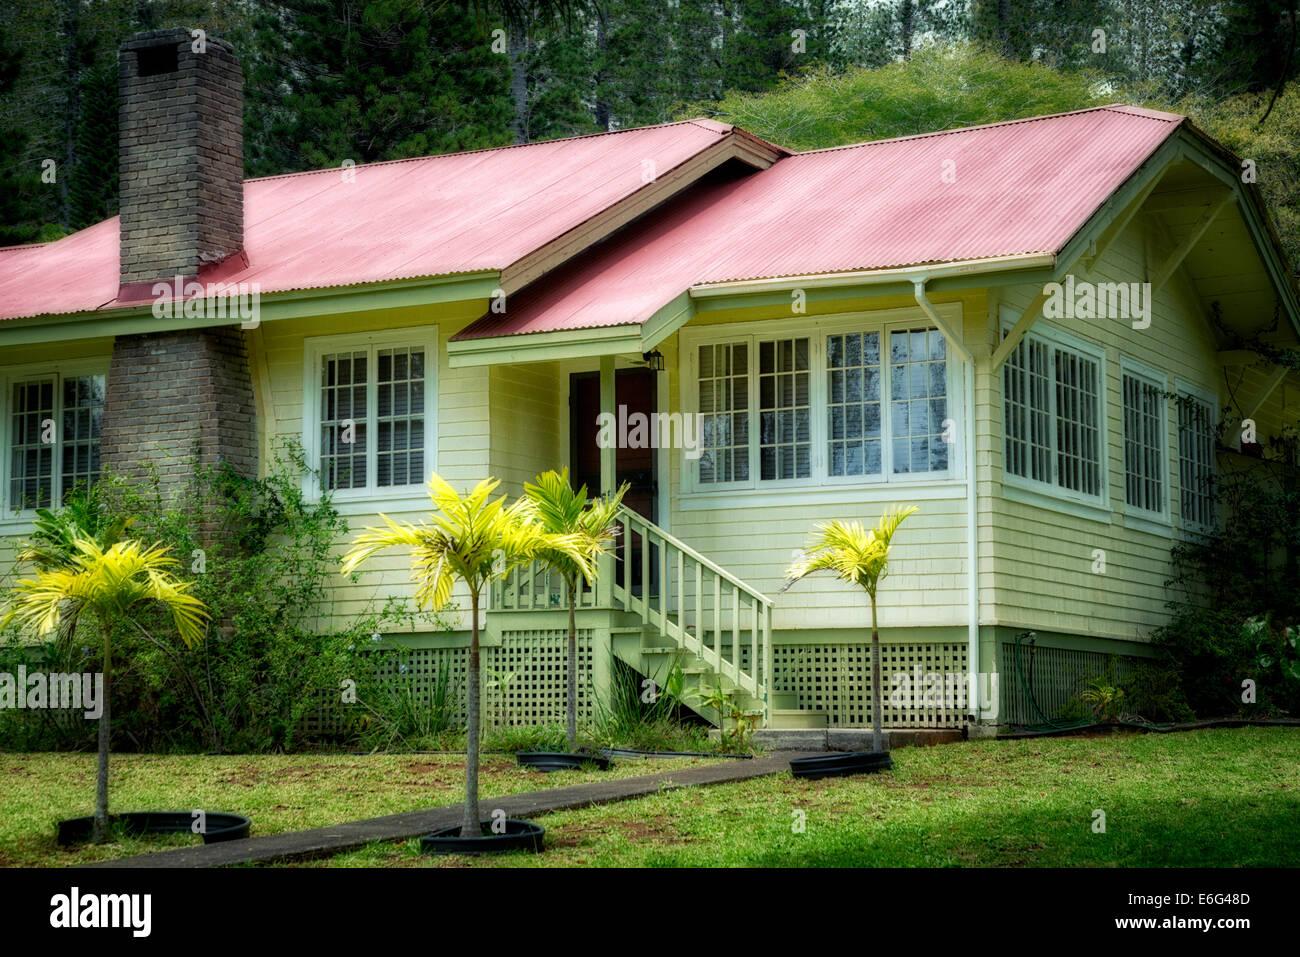 Plantation type house in Lanai City, Lanai, Hawaii. - Stock Image